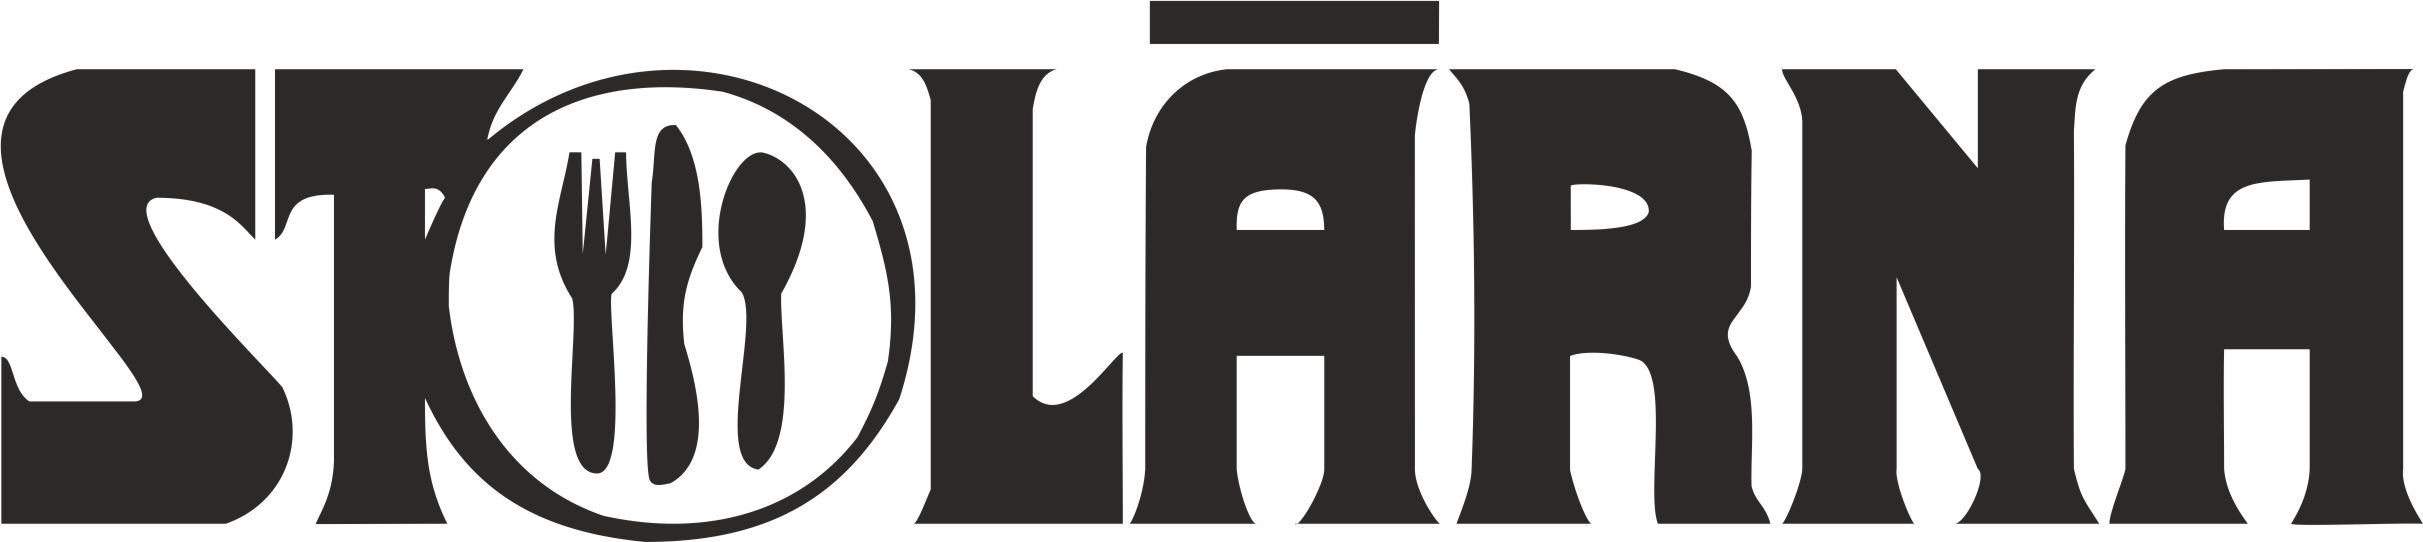 logo-stolarna.jpg